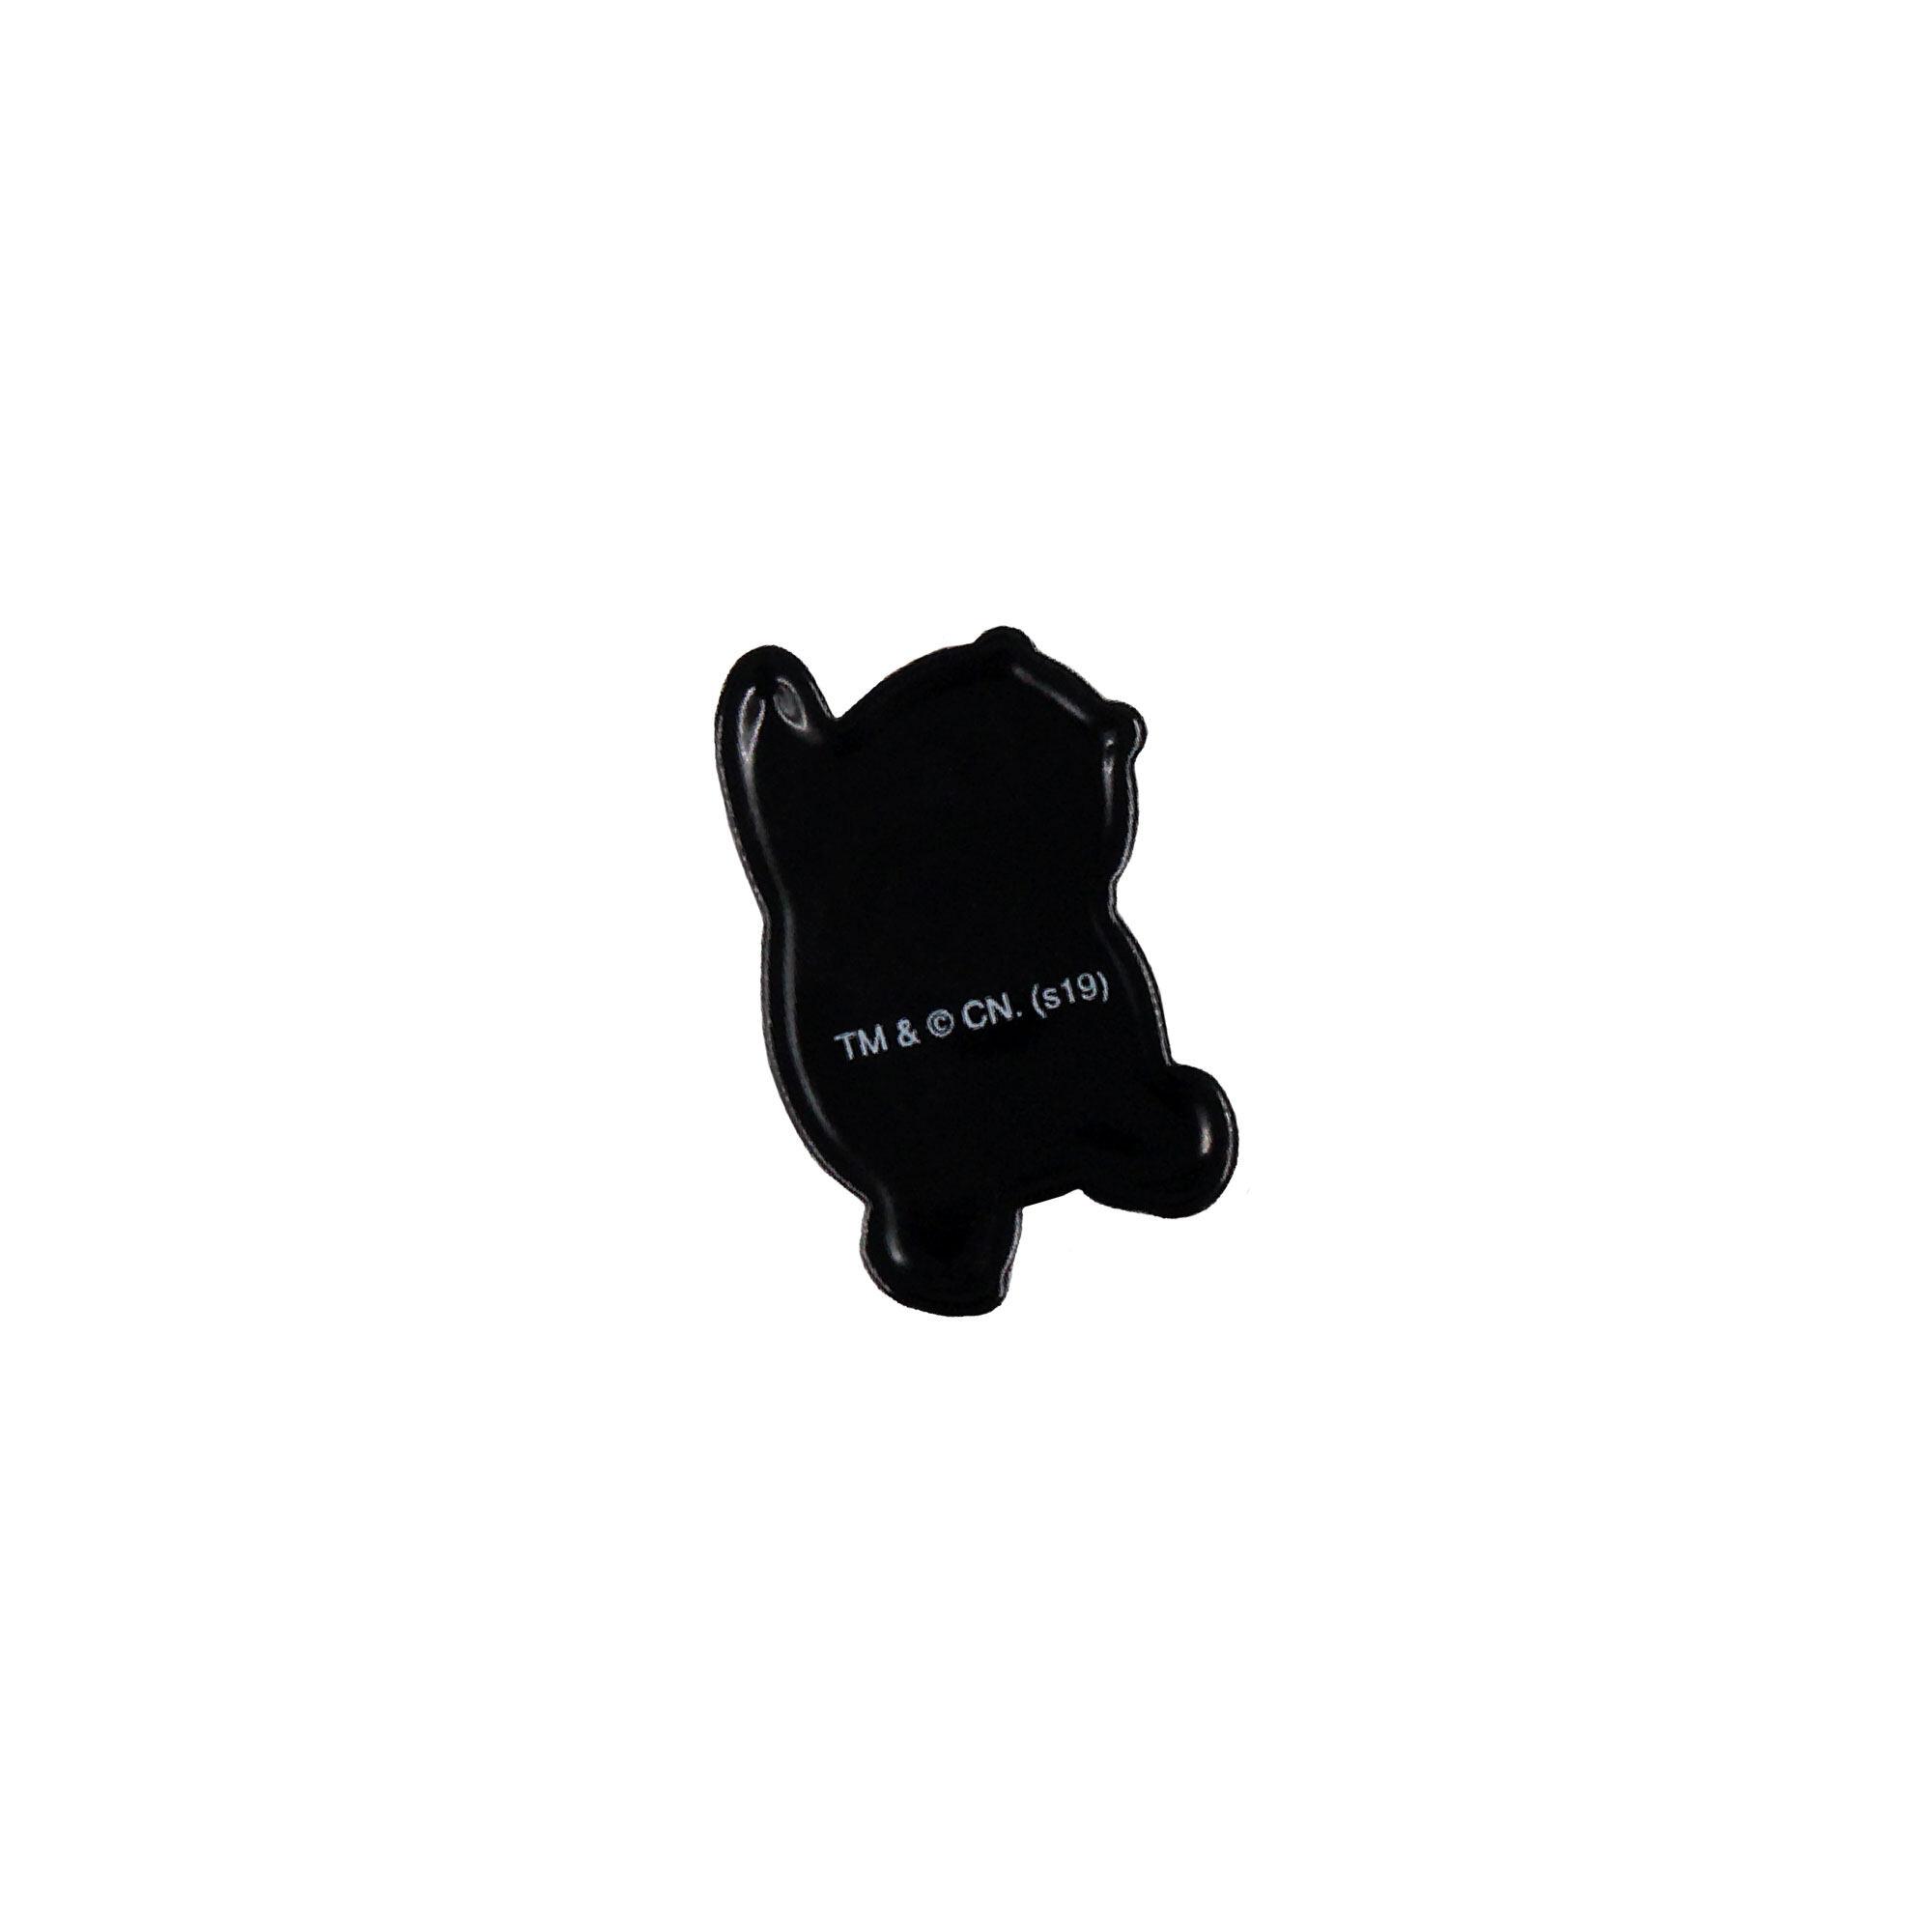 We Bare Bears Panda Pvc Magnet - Grey & White